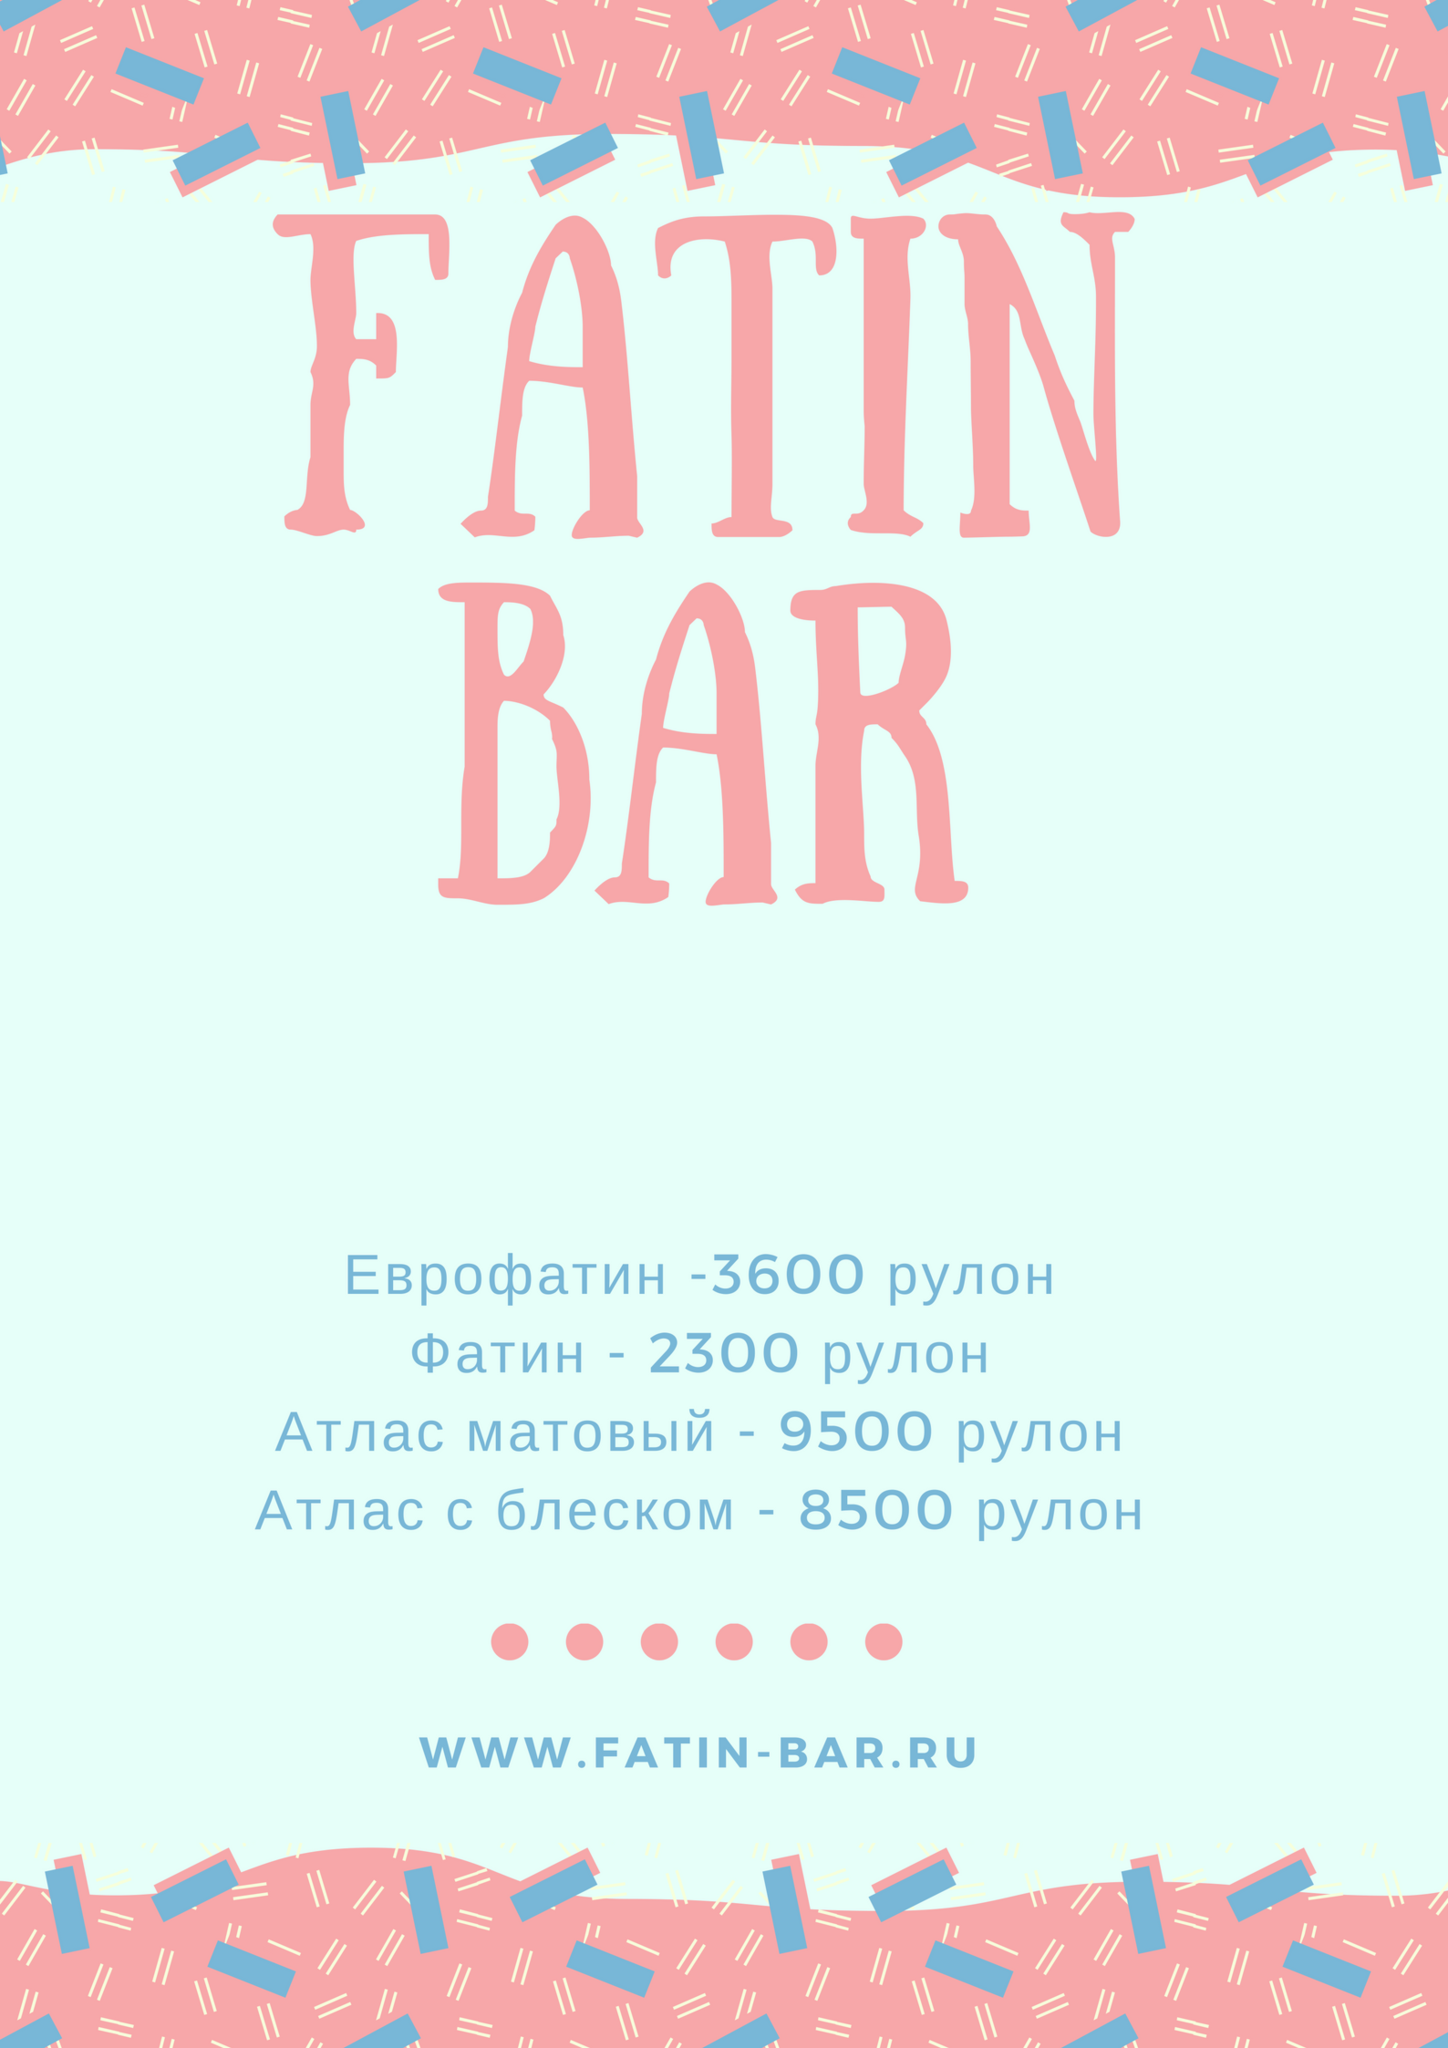 ПРОДАЖА ТКАНИ ОПТОМ - ФАТИН, ЕВРОФАТИН, АТЛАС МАТОВЫЙ